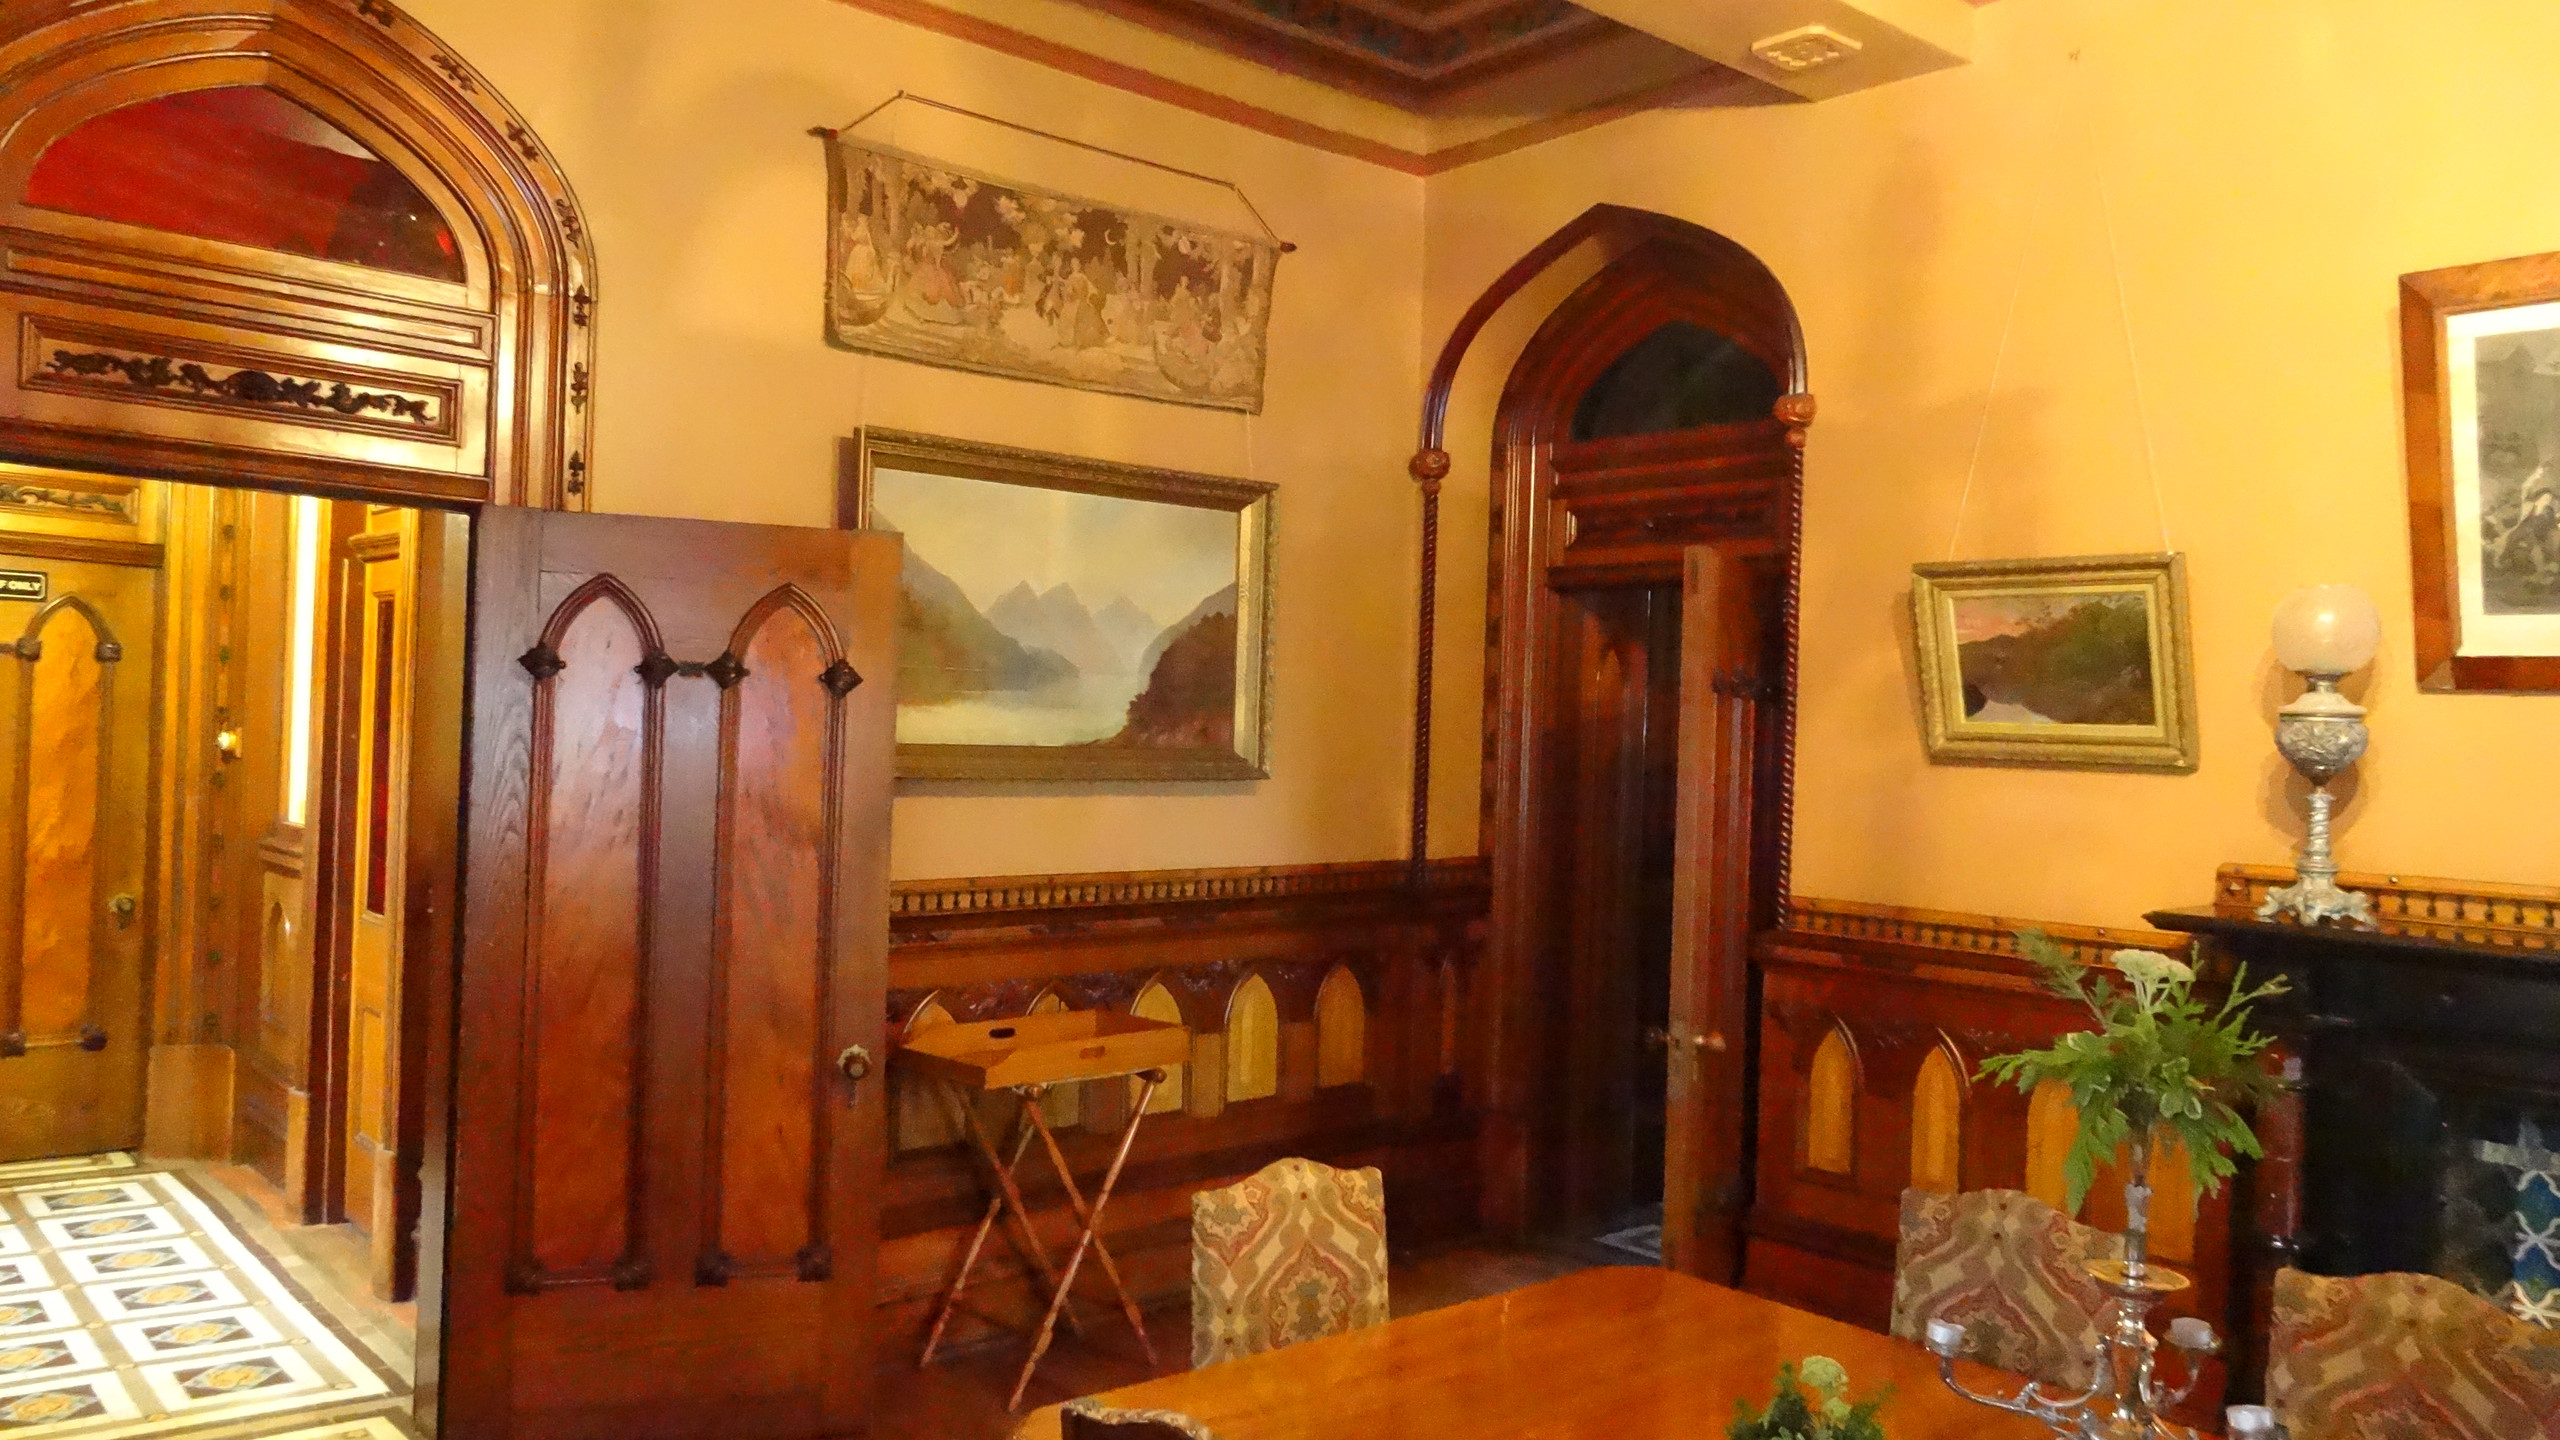 Larnach castle interior, Dunedin, New Zealand travel blog, New Zealand tours